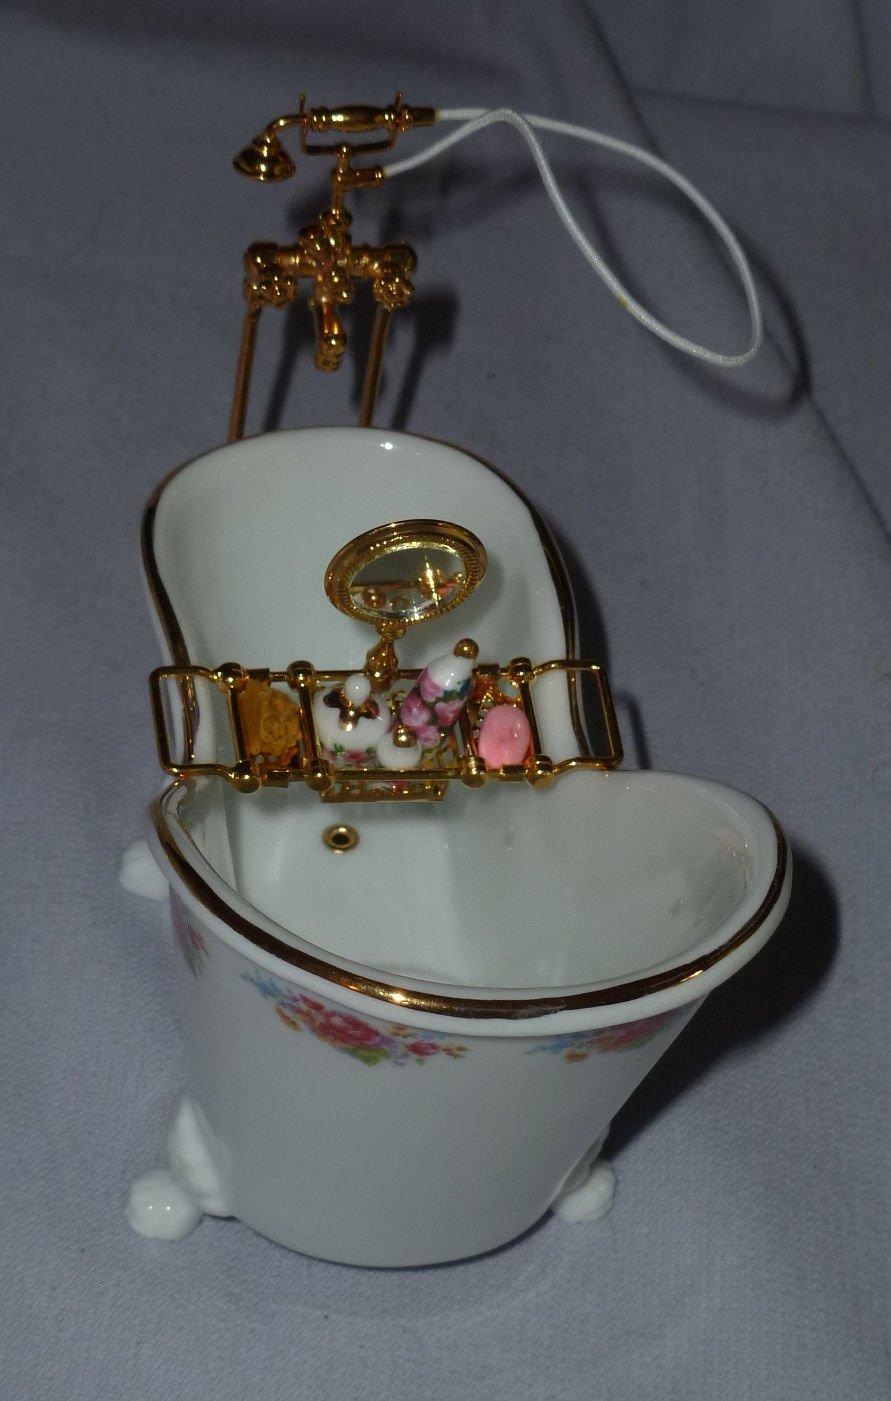 Reutter Porcelain Miniature Dollhouse Bathtub with Shower Spray and Tub Rack